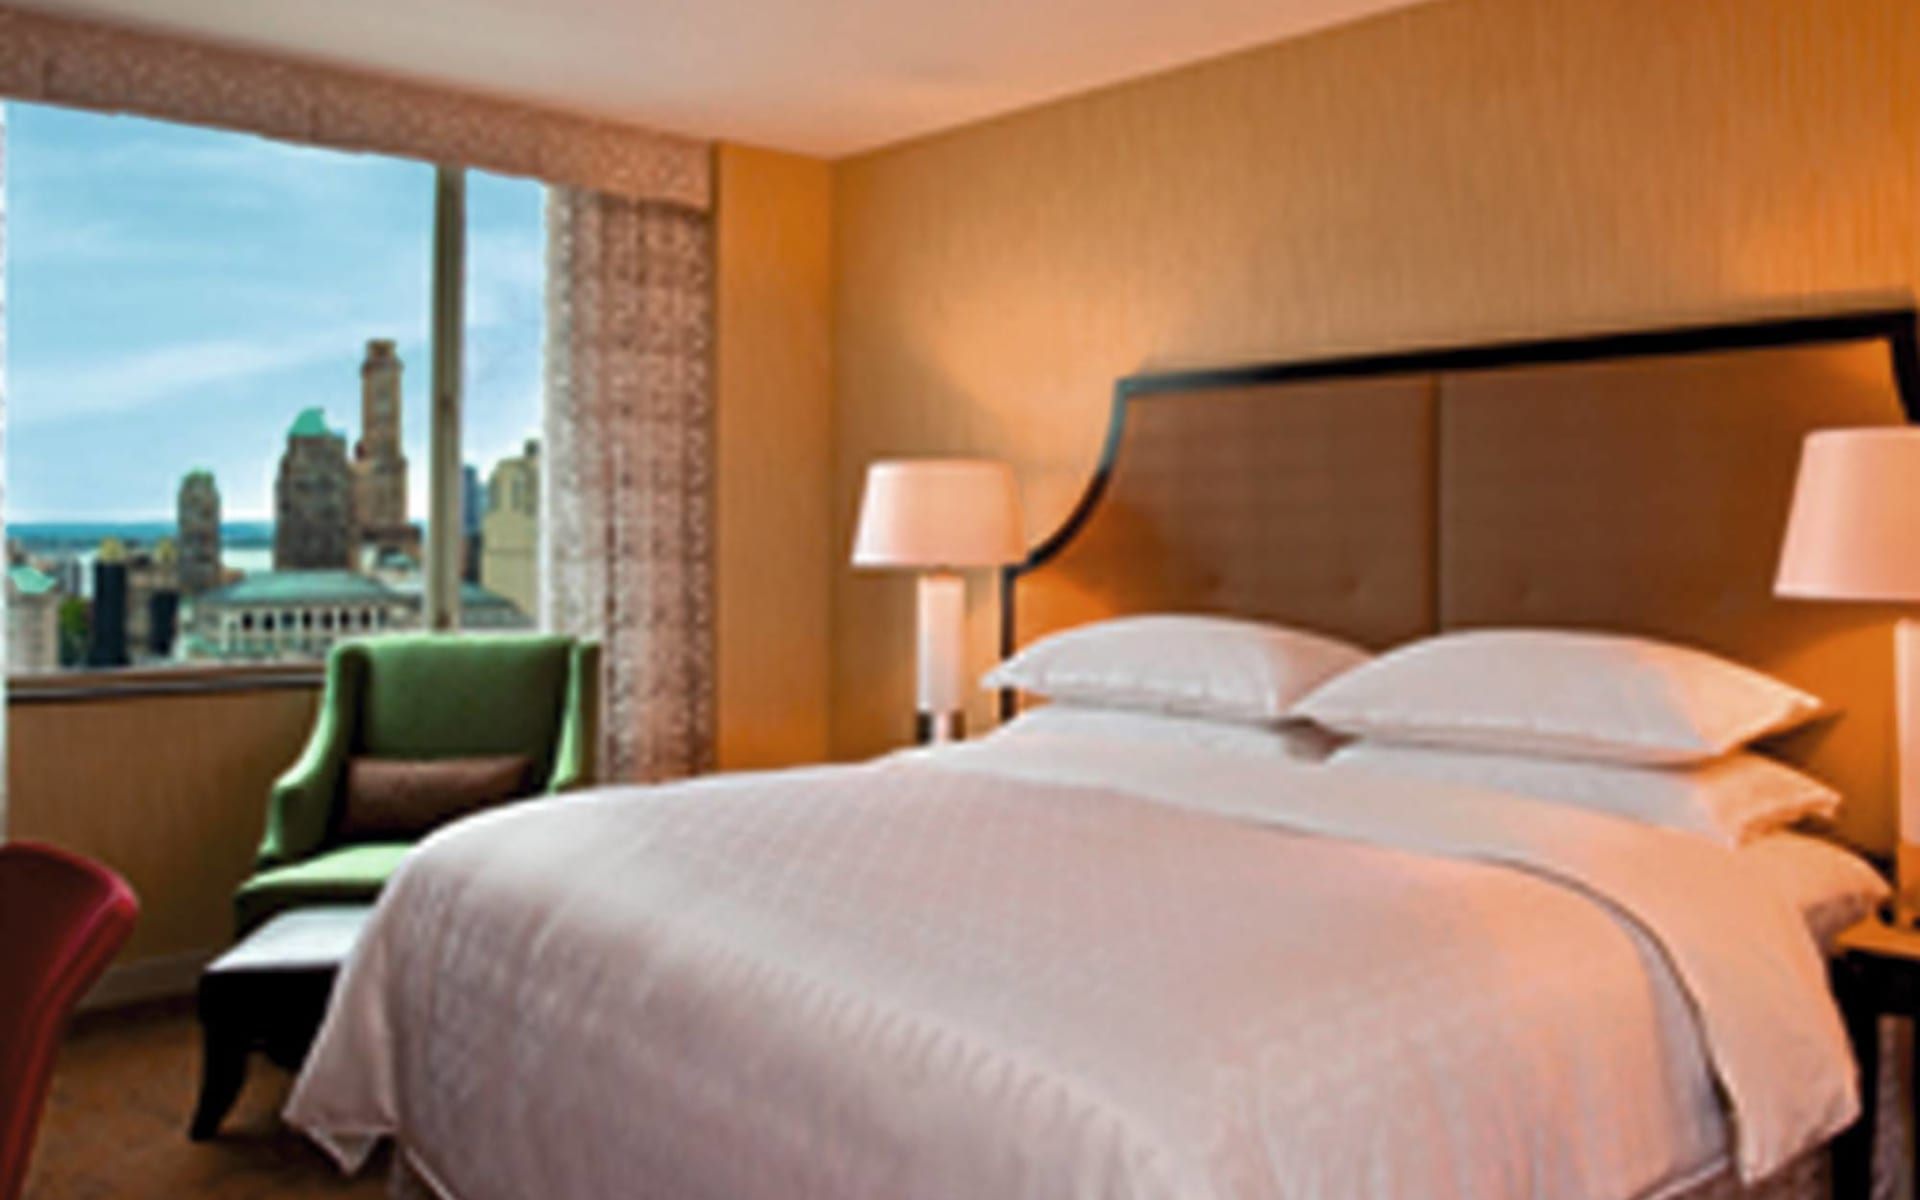 Sheraton Brooklyn New York Hotel in New York - Brooklyn: zimmer sheraton brooklyn doppelzimmer